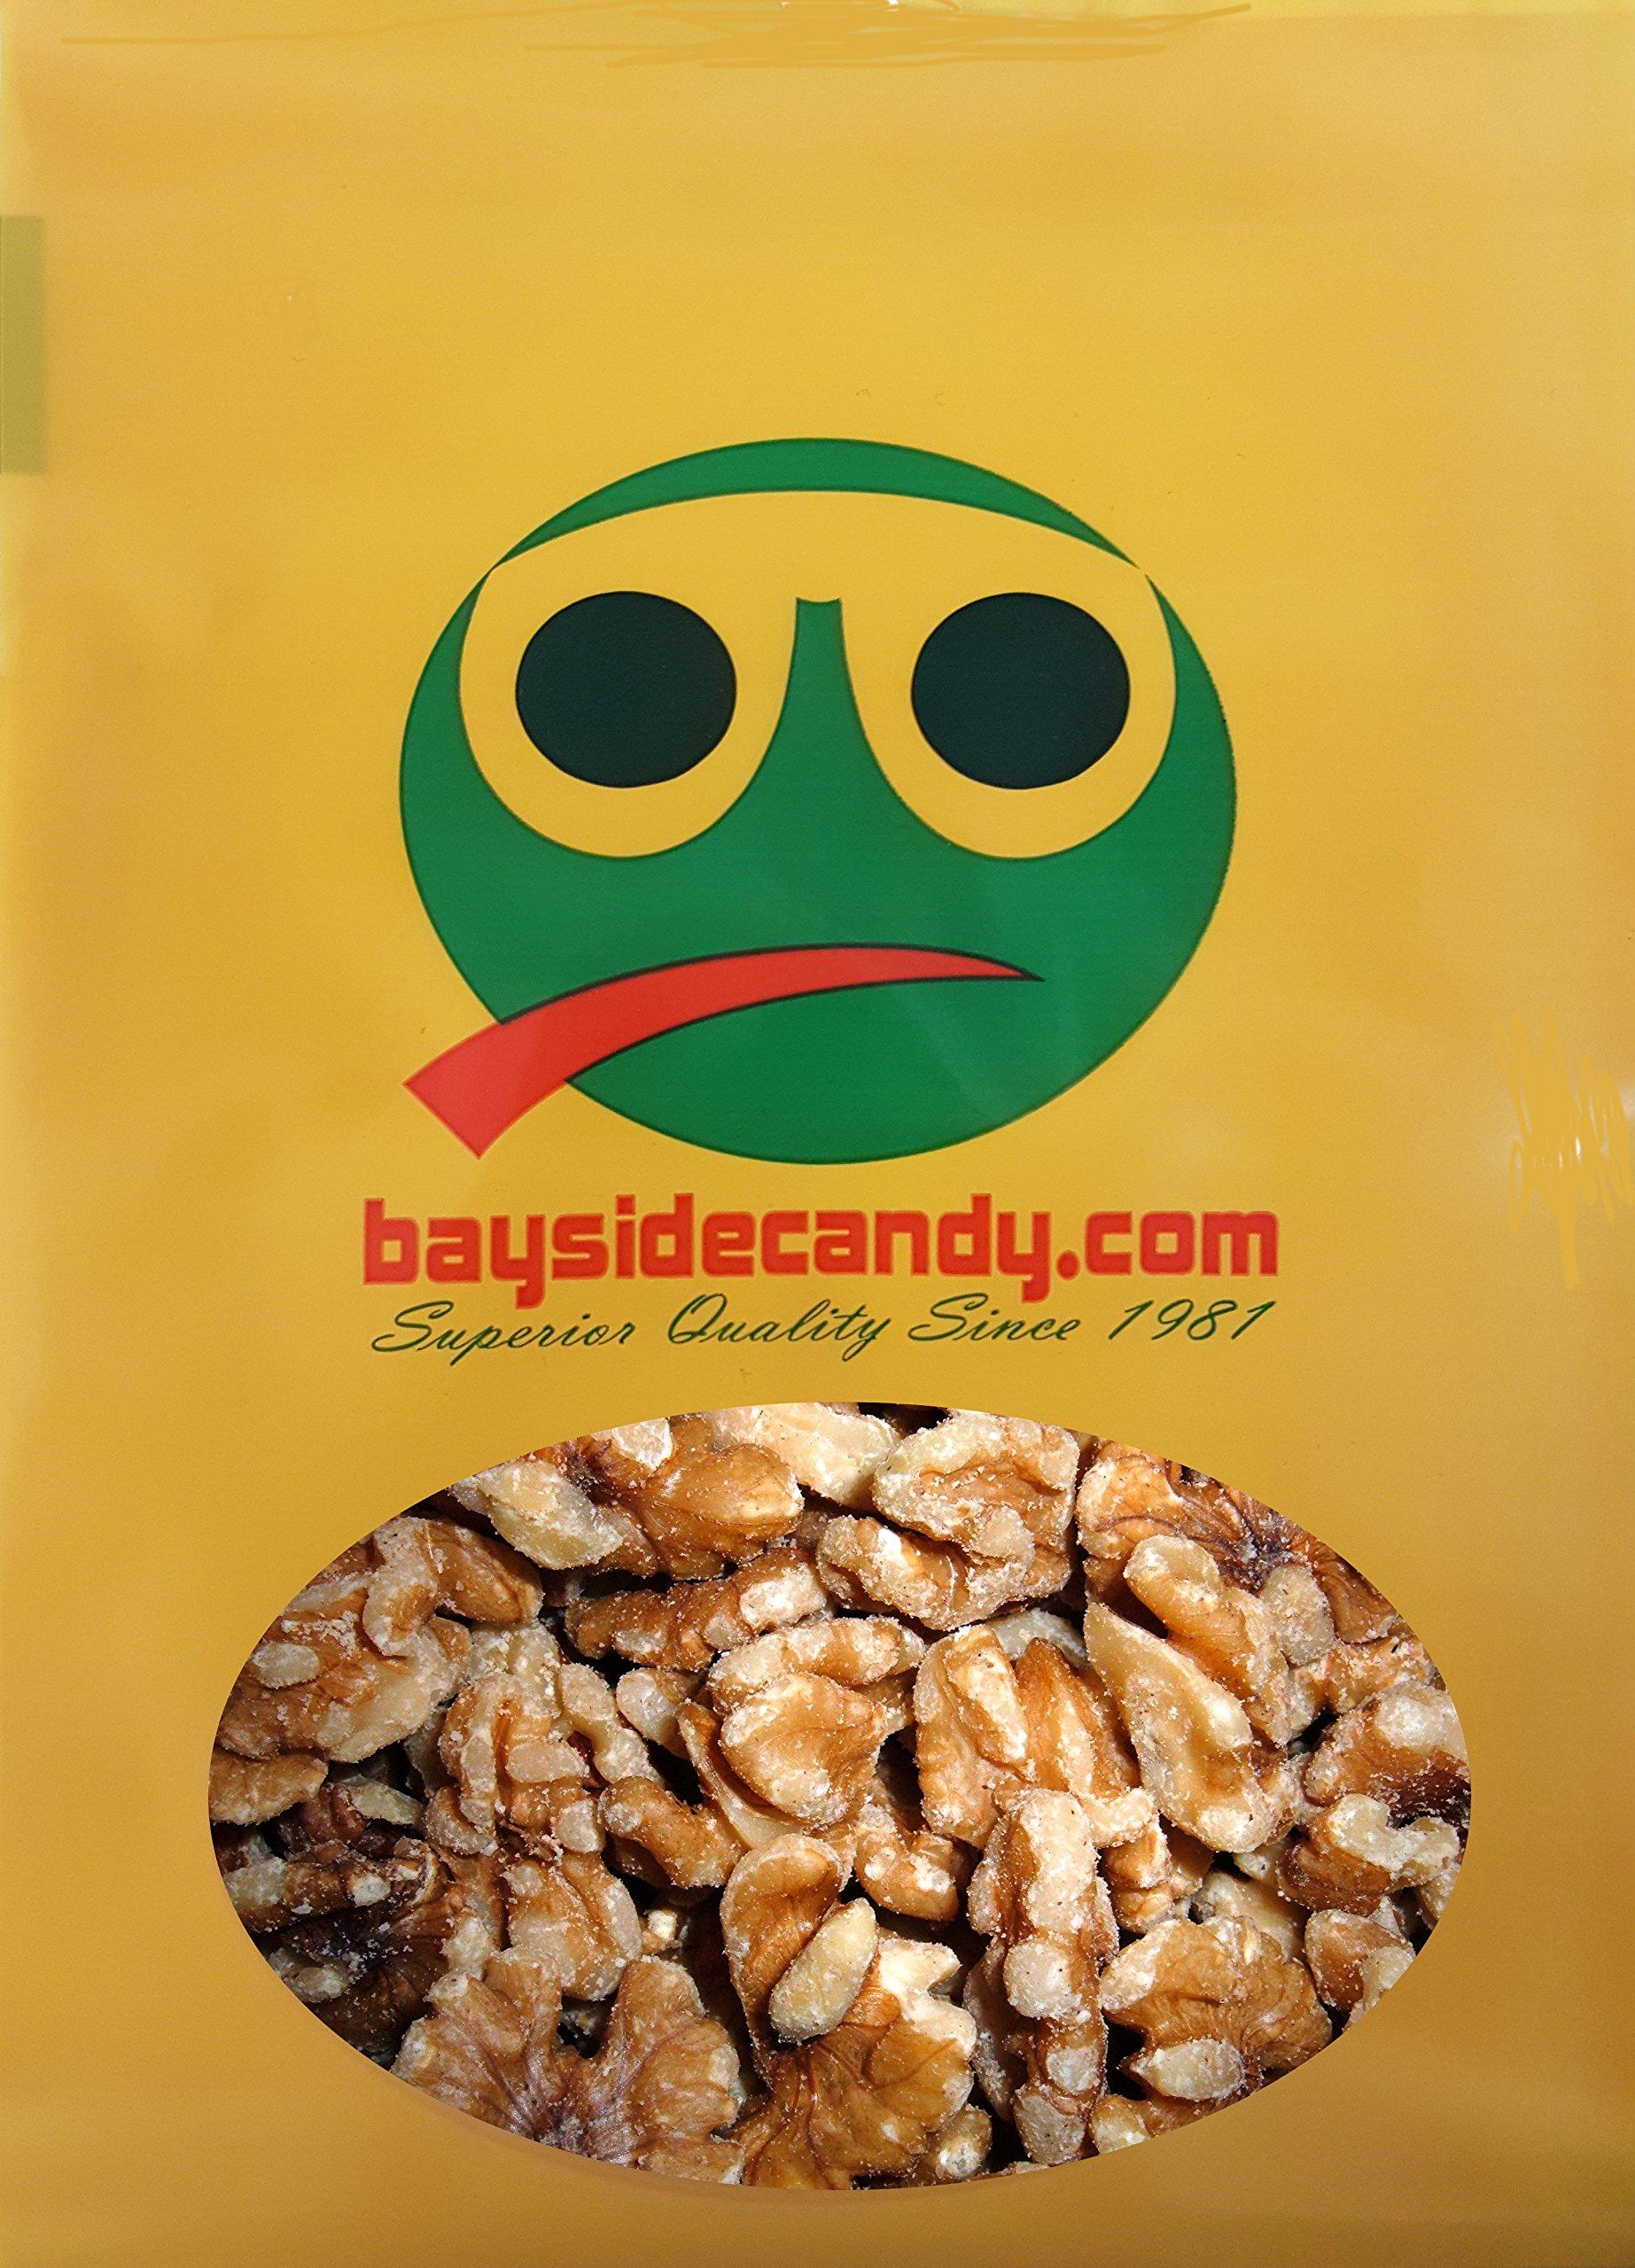 Bulk Walnuts 25 lb. Light Halves & Pieces